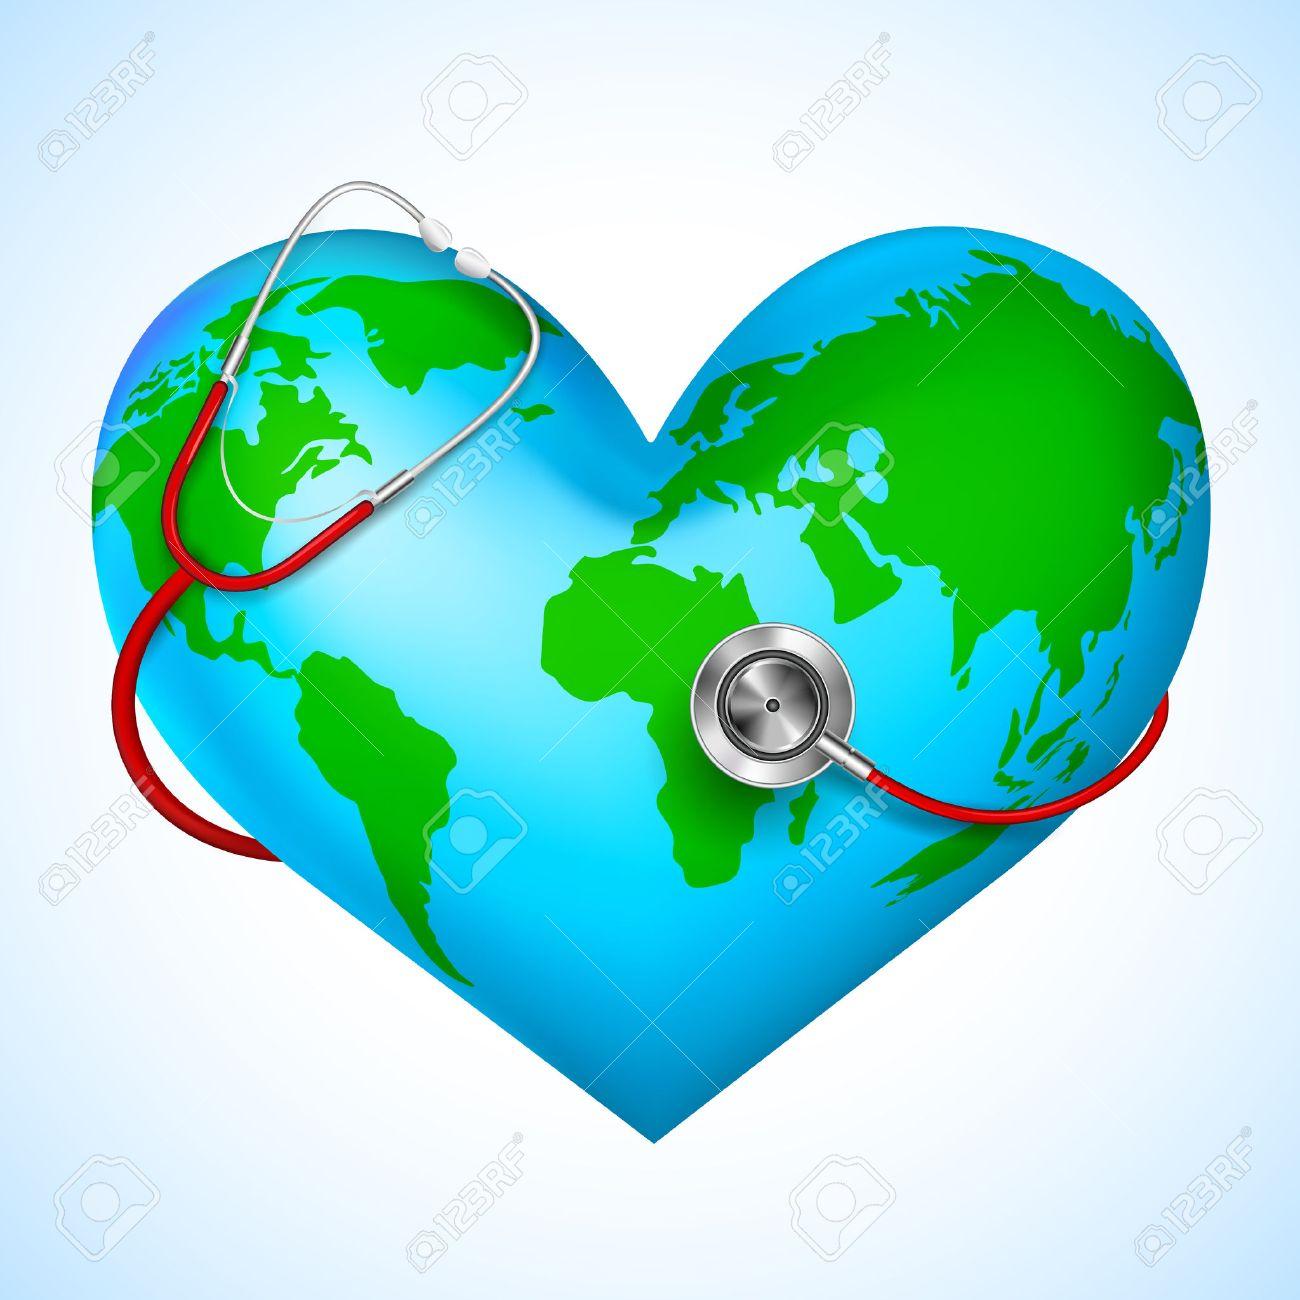 Stethoscope around hearth shaped world - 38467547